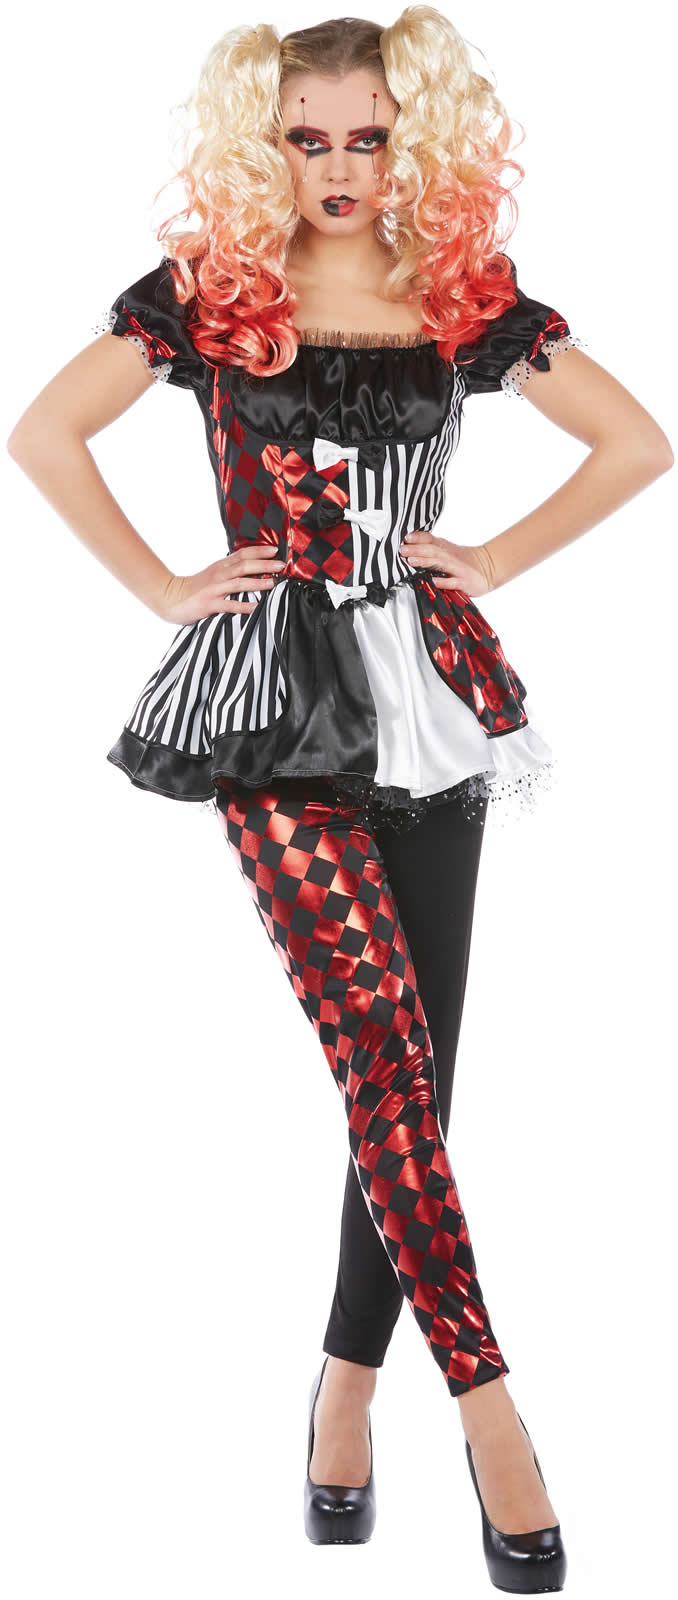 adebf203f07c0 Details zu Harlekin Clown Karneval Fasching Kostüm 34-42